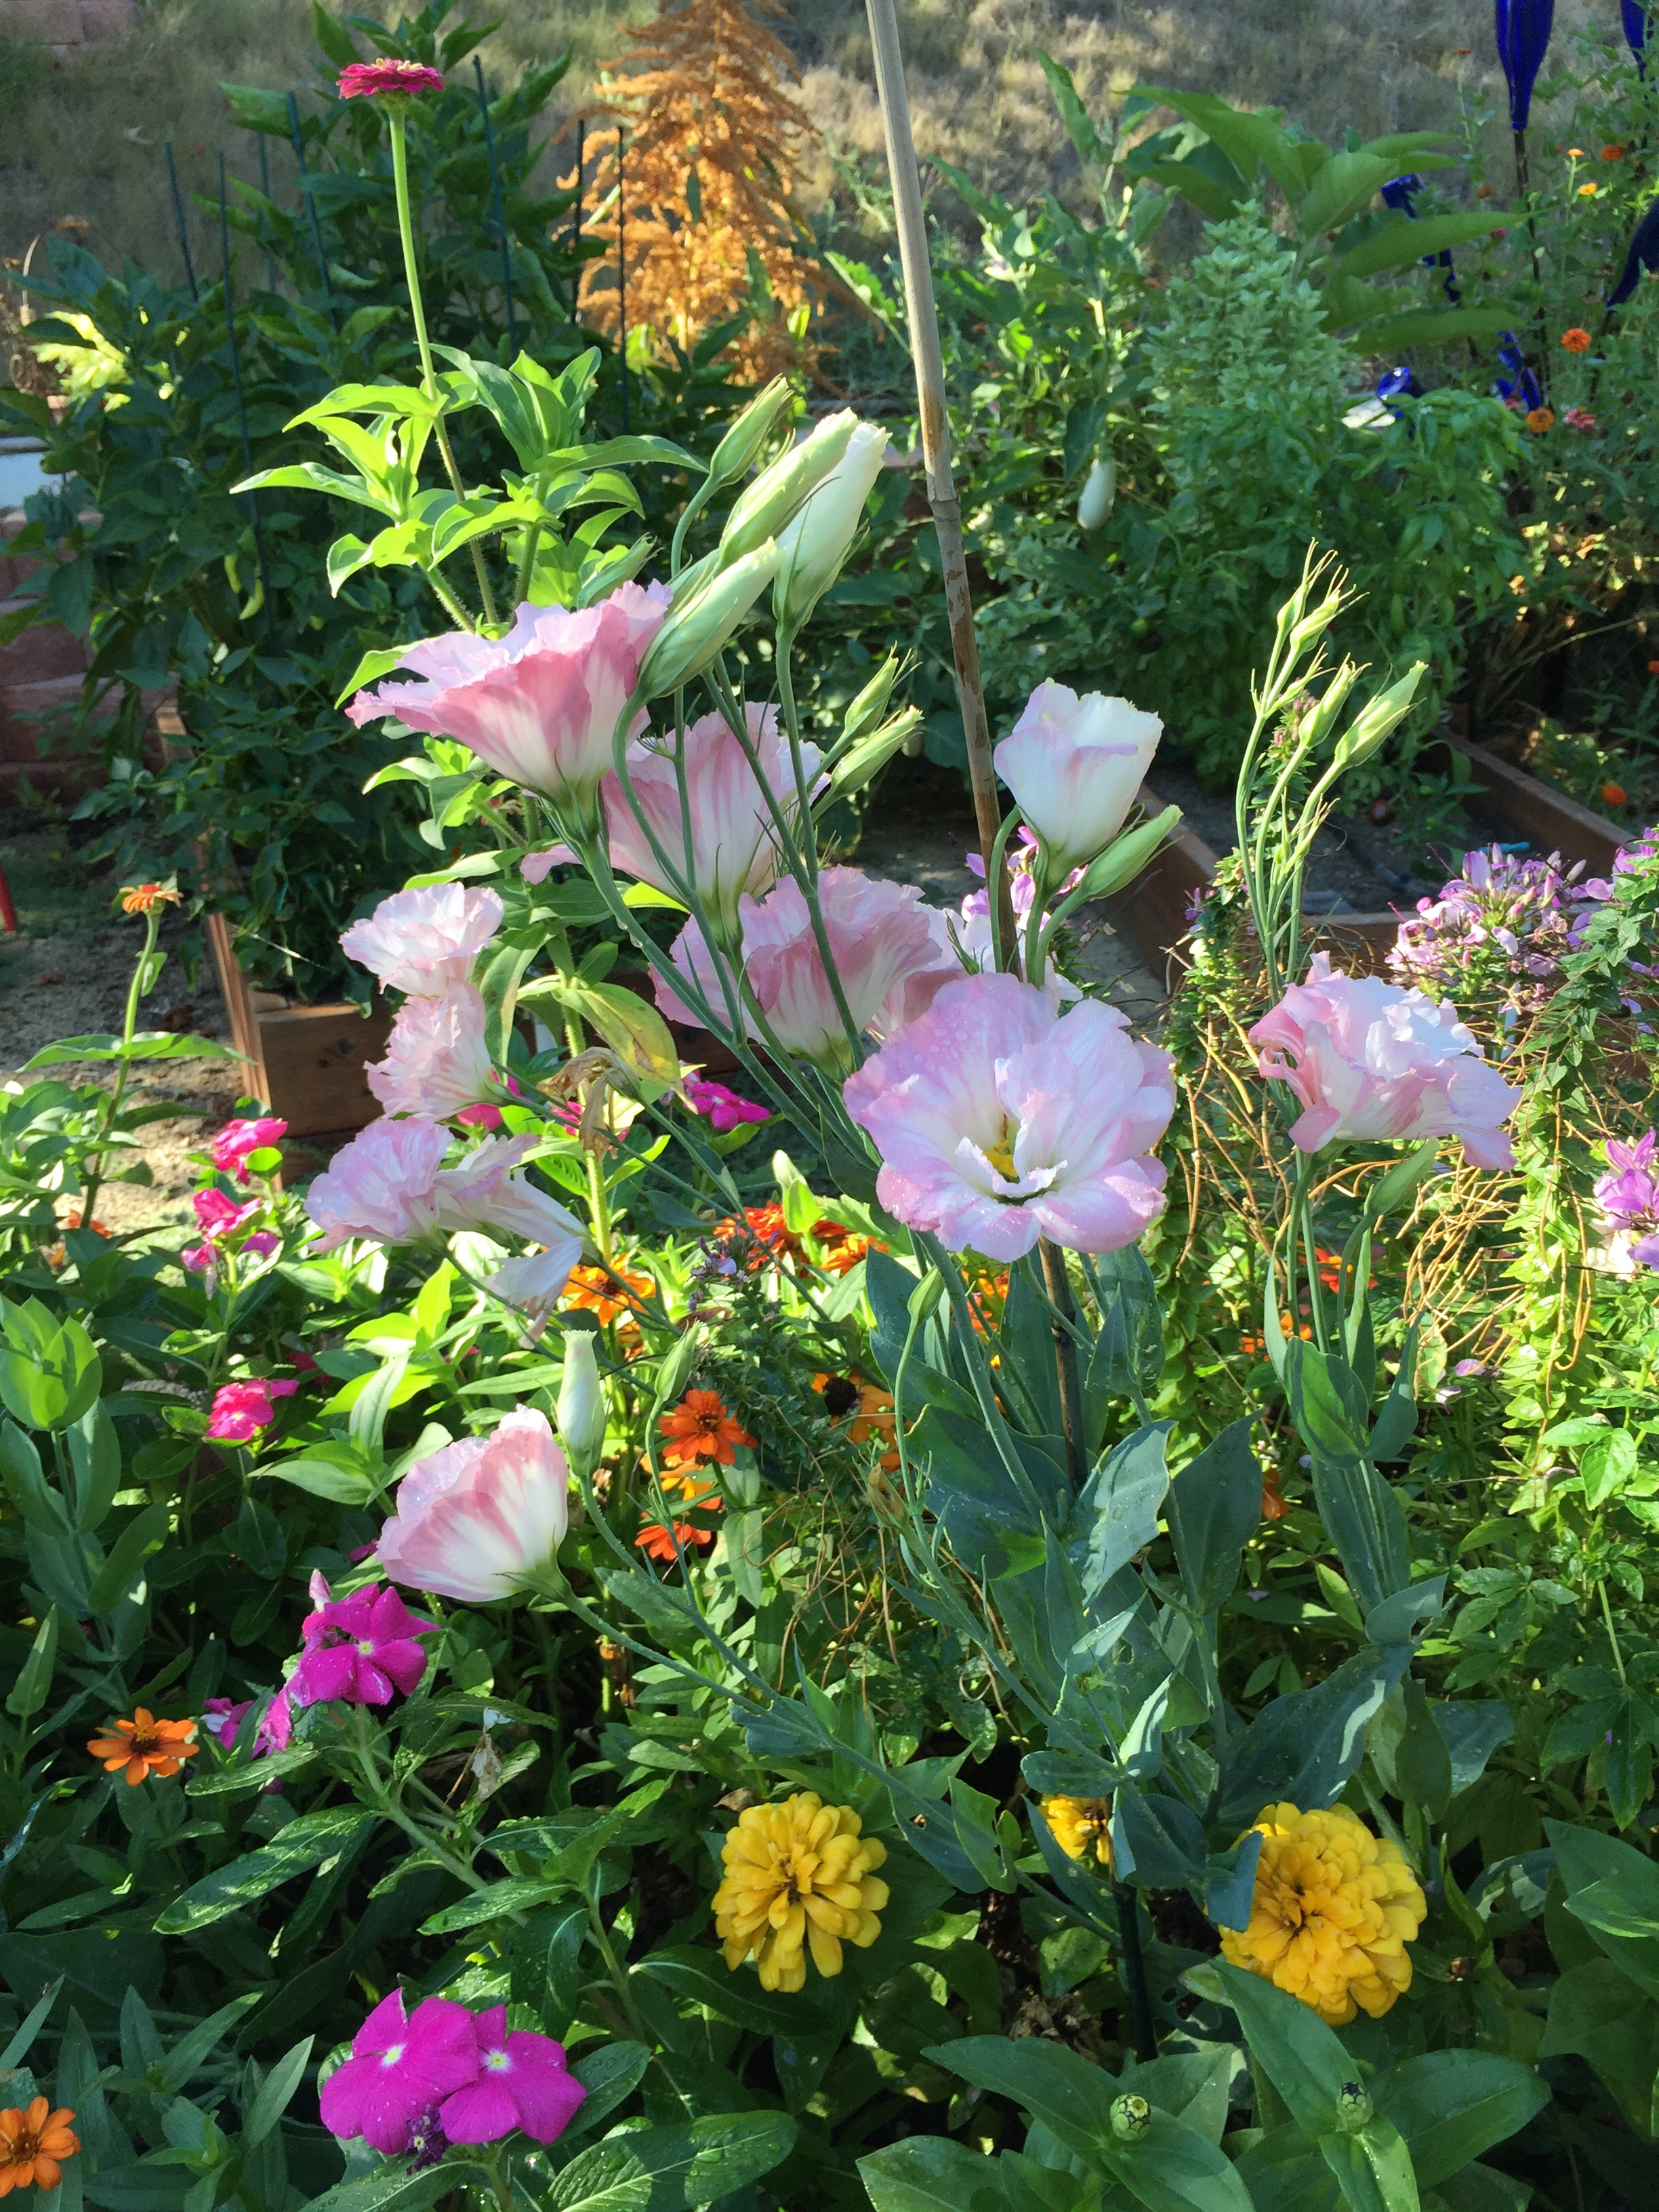 Flower garden - www.turnaroundat50.com